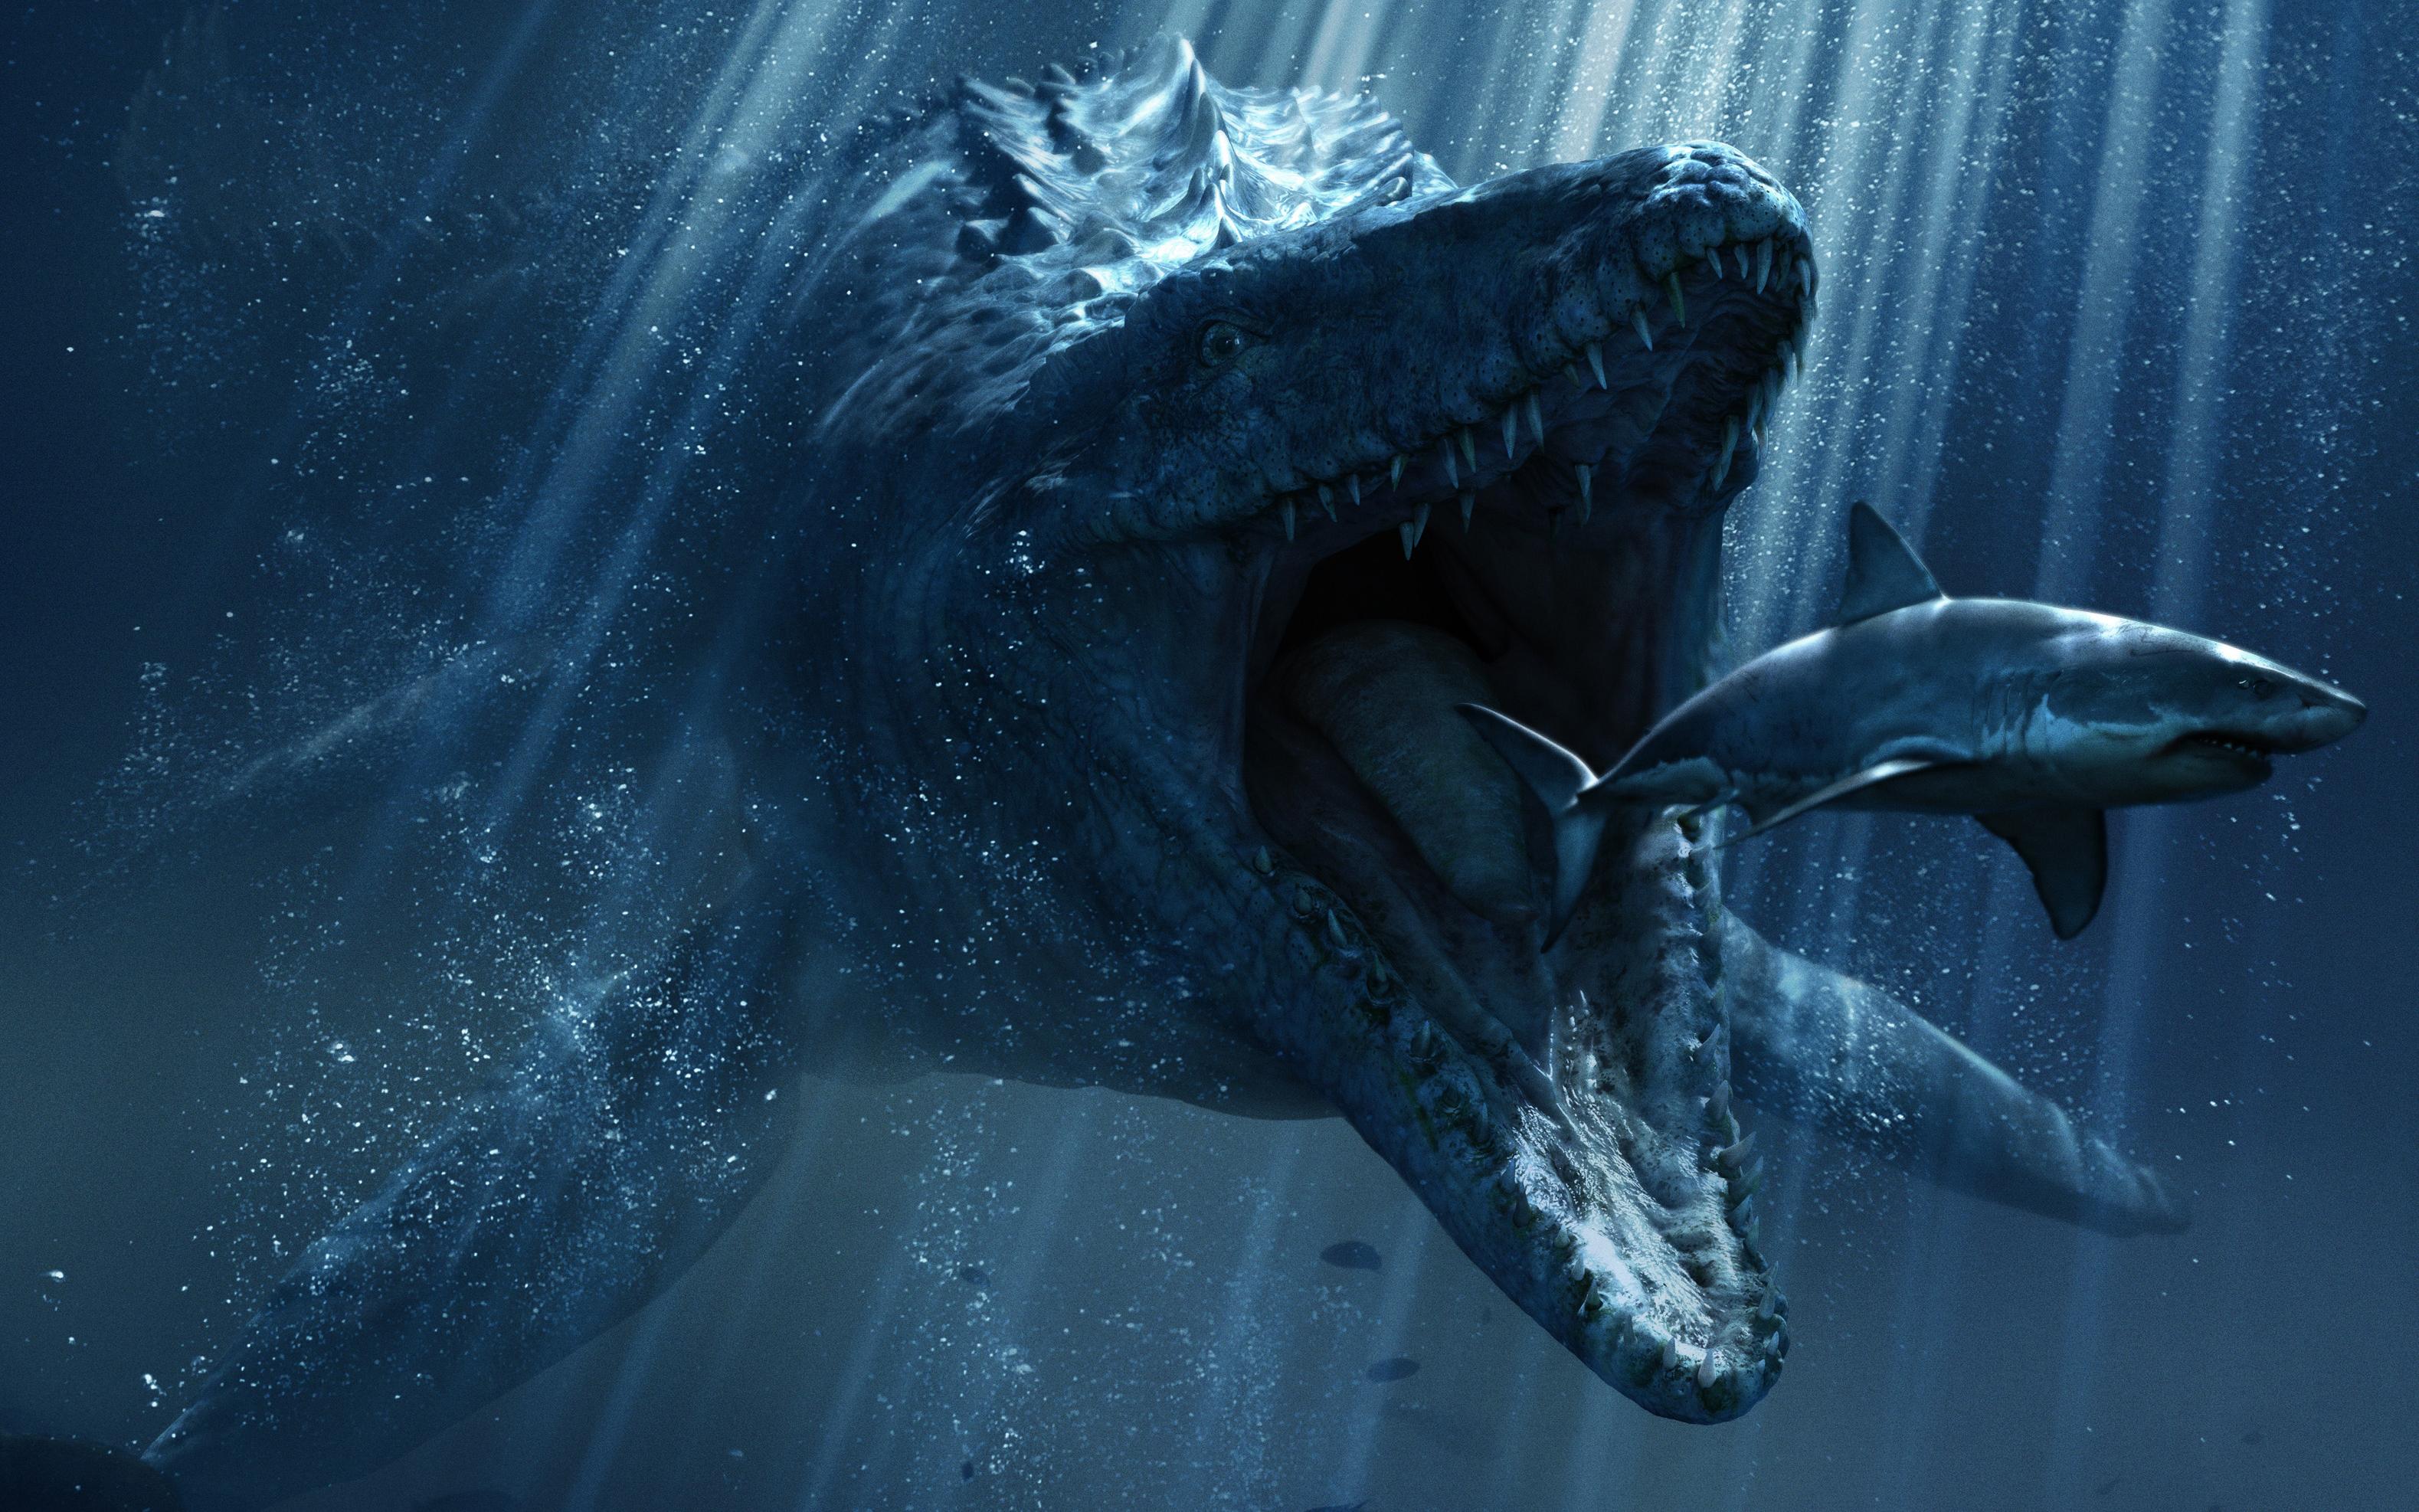 61 Jurassic World HD Wallpapers Backgrounds Wallpaper Abyss